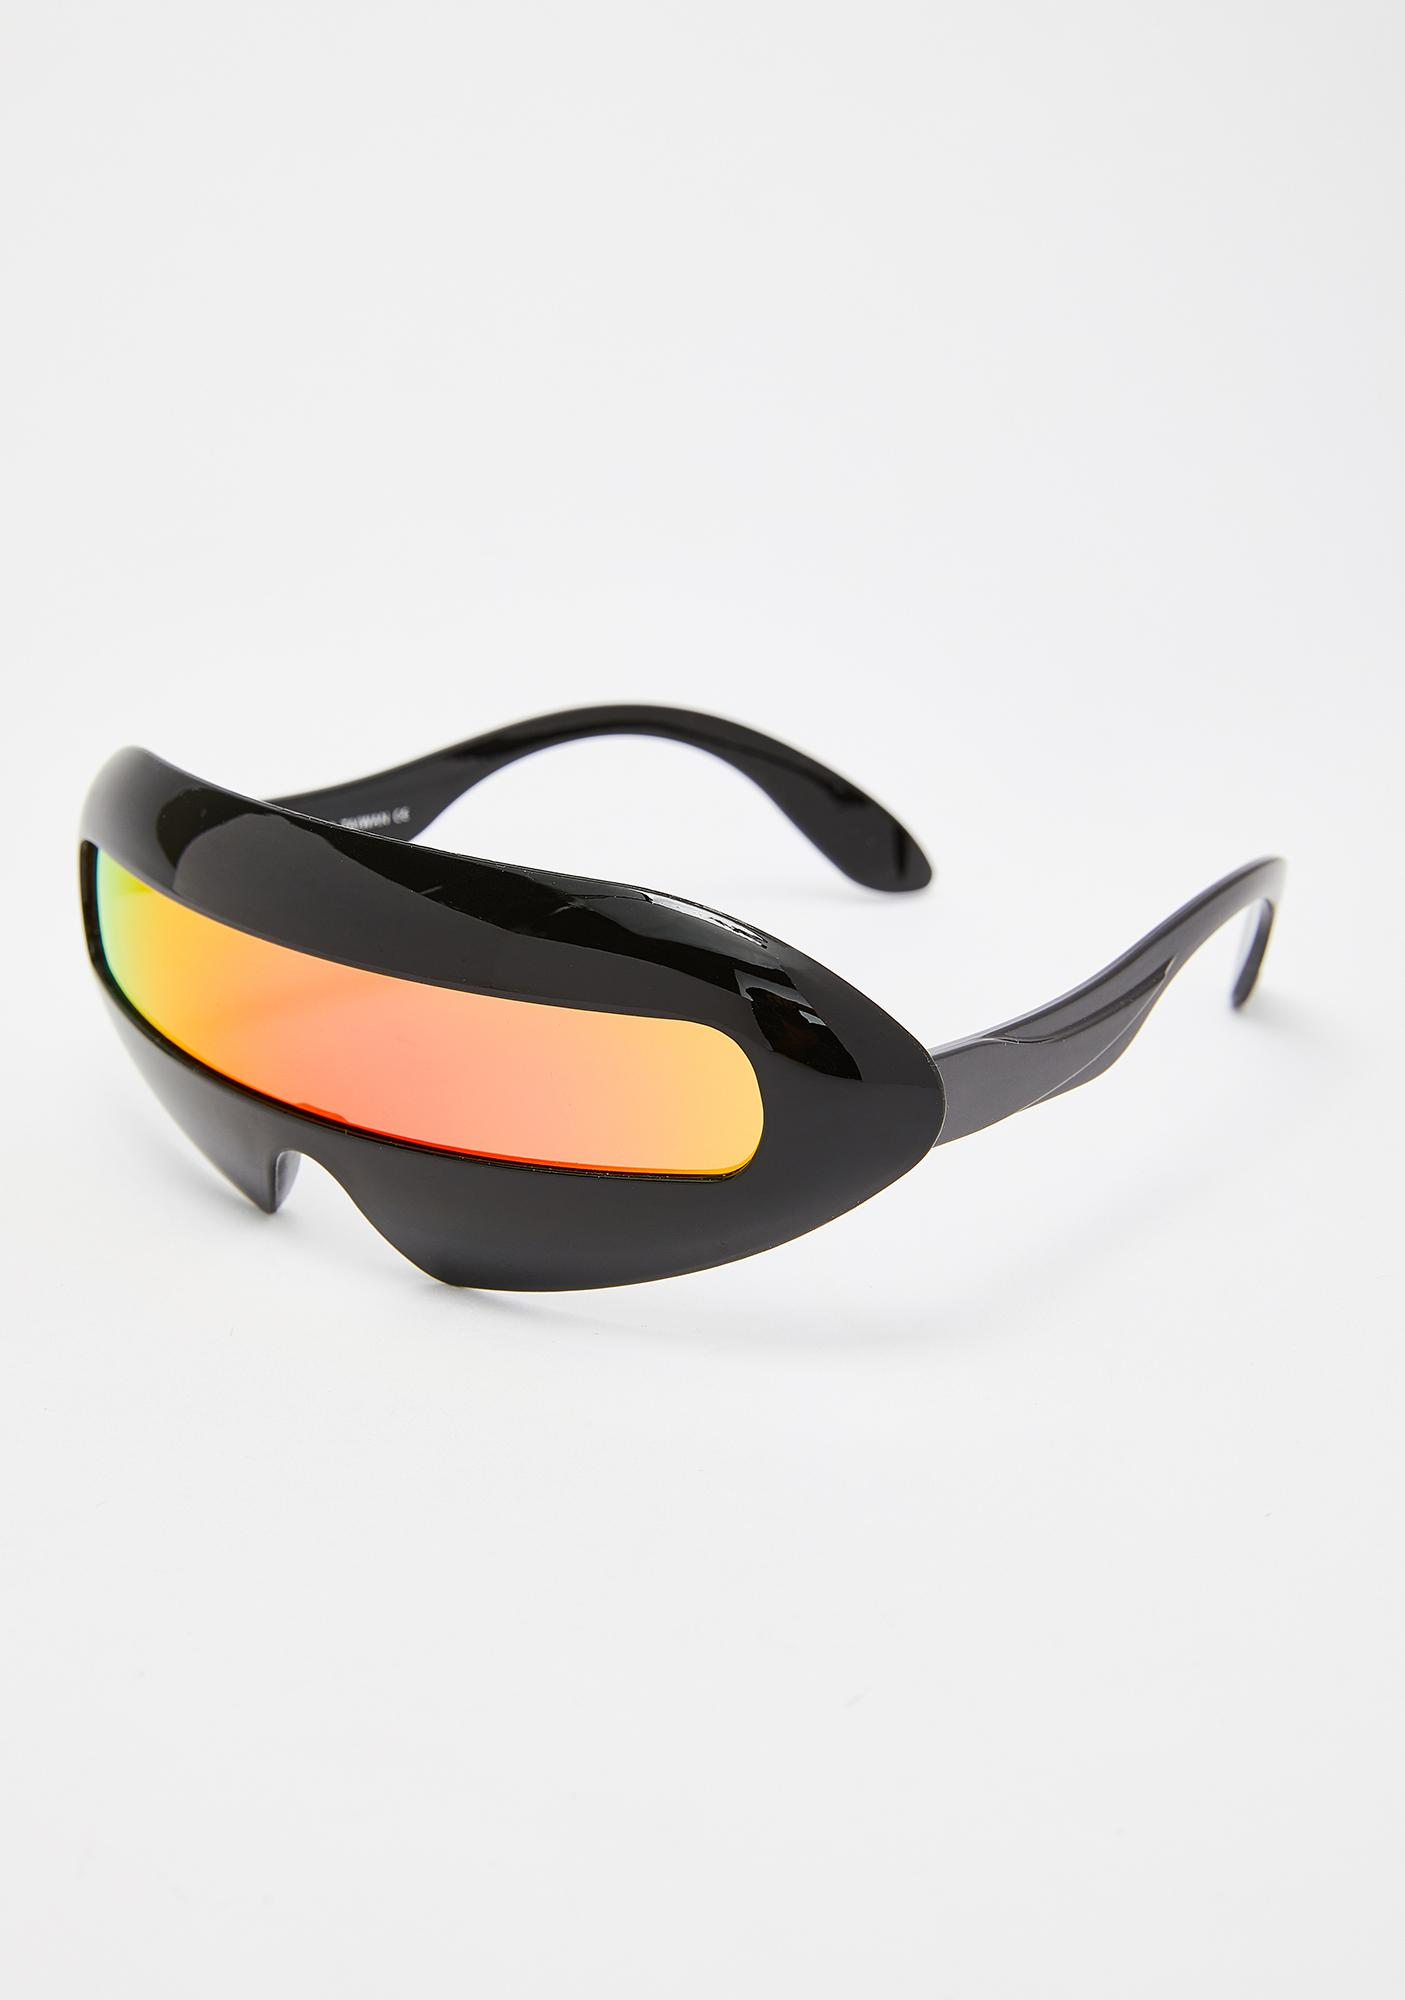 Replay Vintage Sunglasses Fire Revo Shield Sunglasses